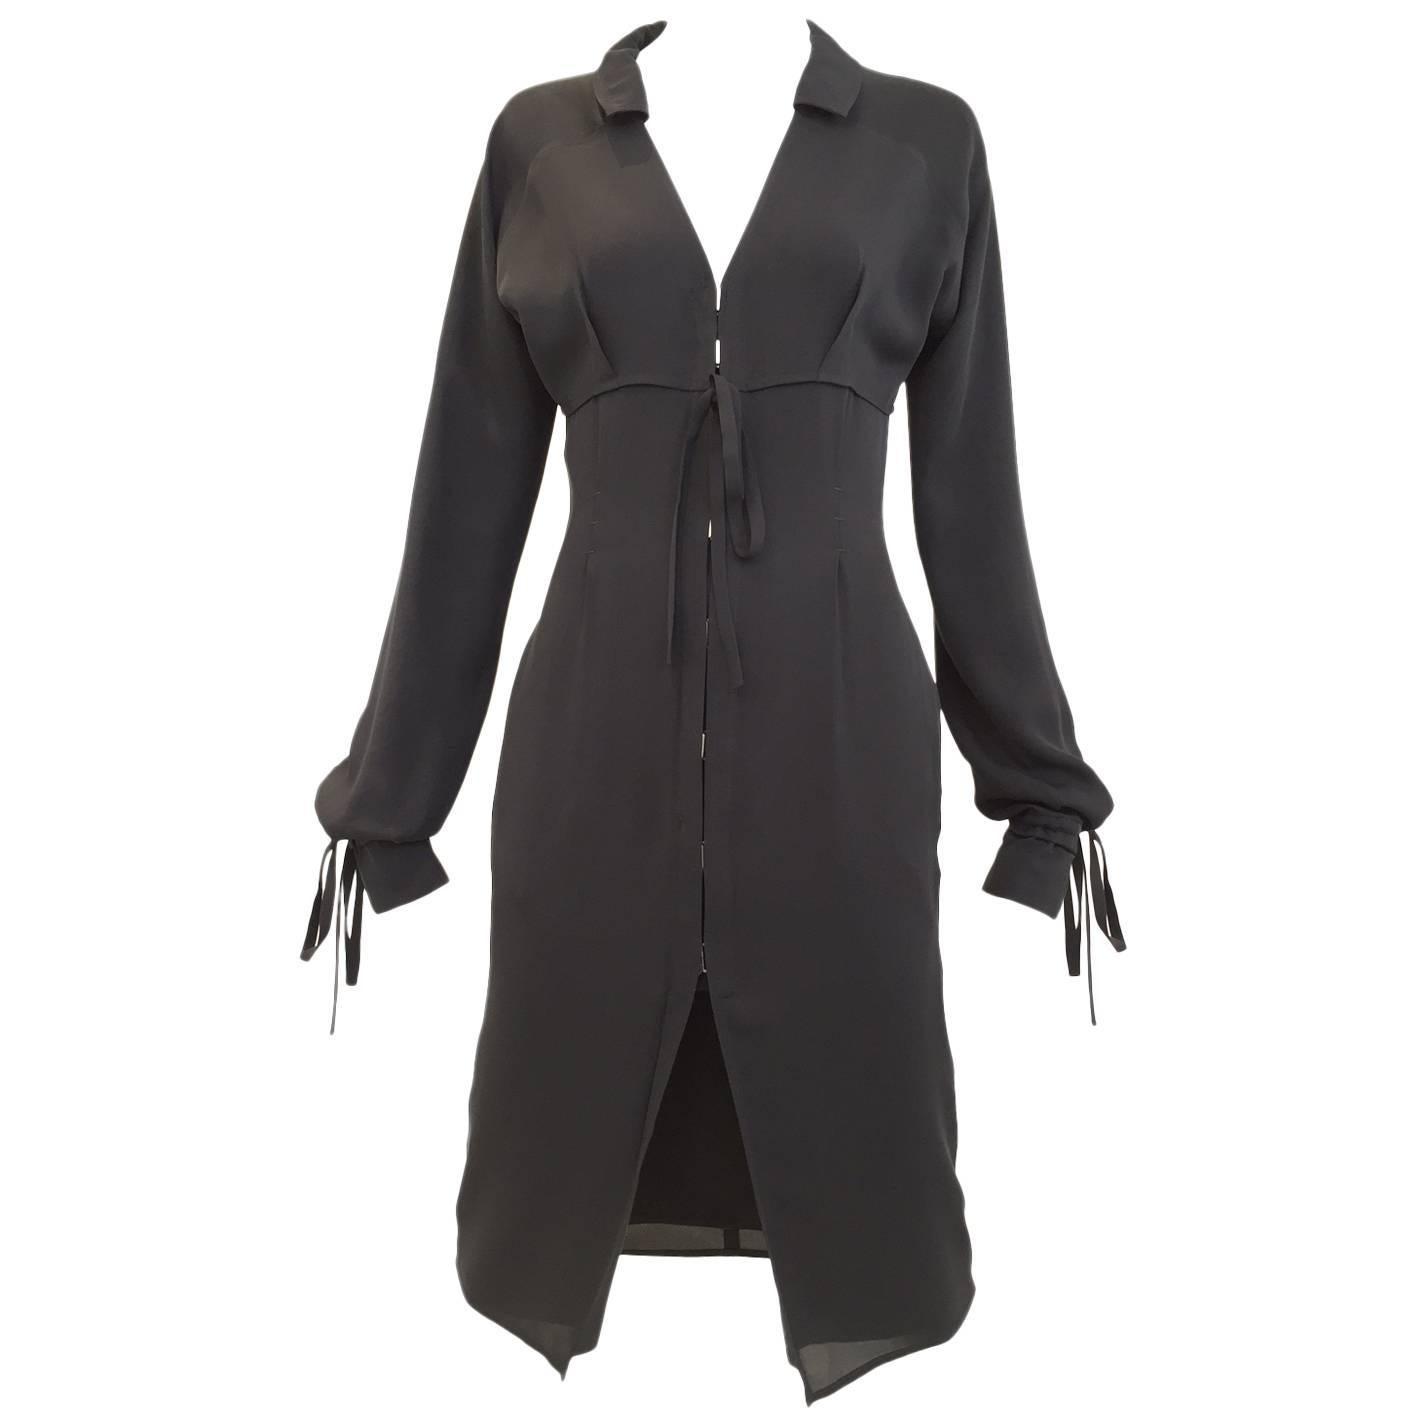 Yves Saint Laurent by Tom Ford black silk cocktail dress